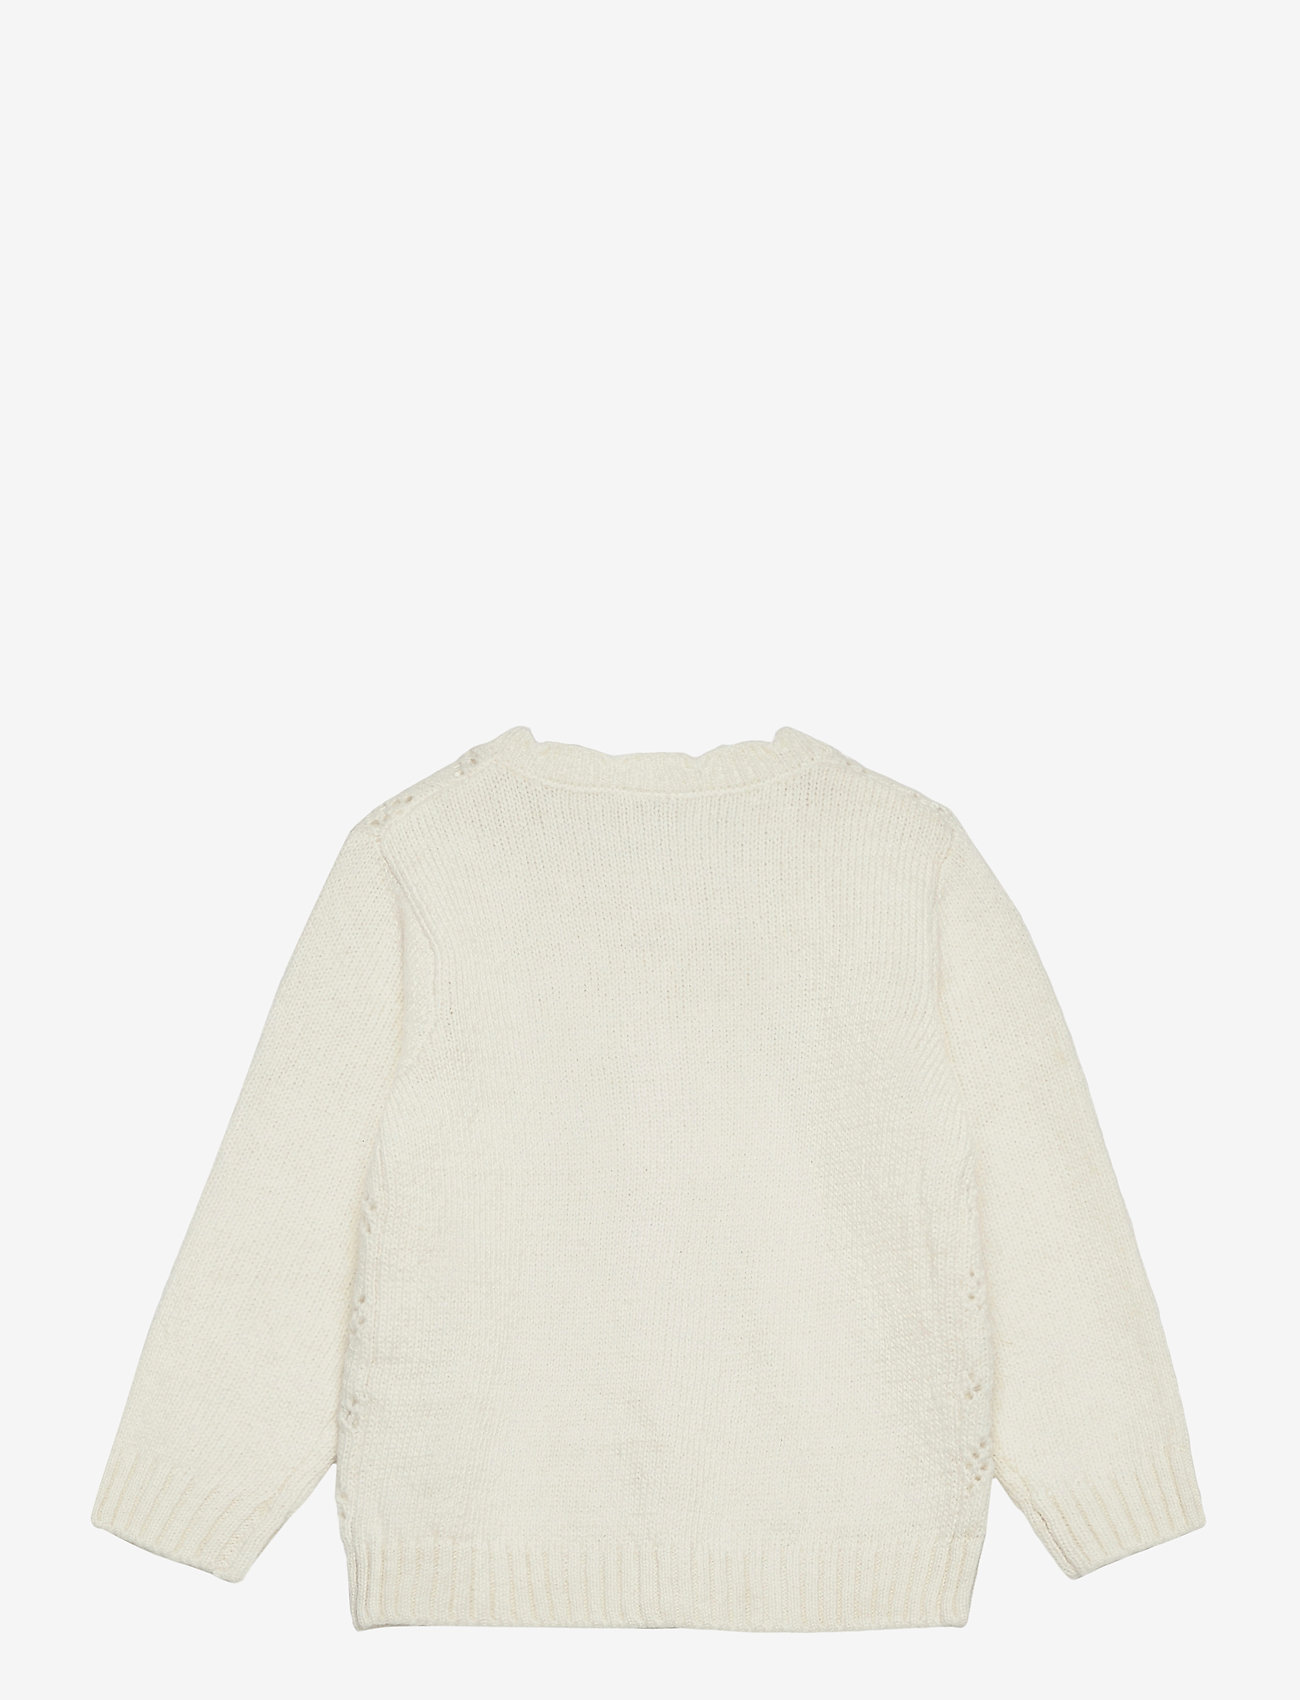 Lindex - Cardigan patternknit scallop e - gilets - white - 1